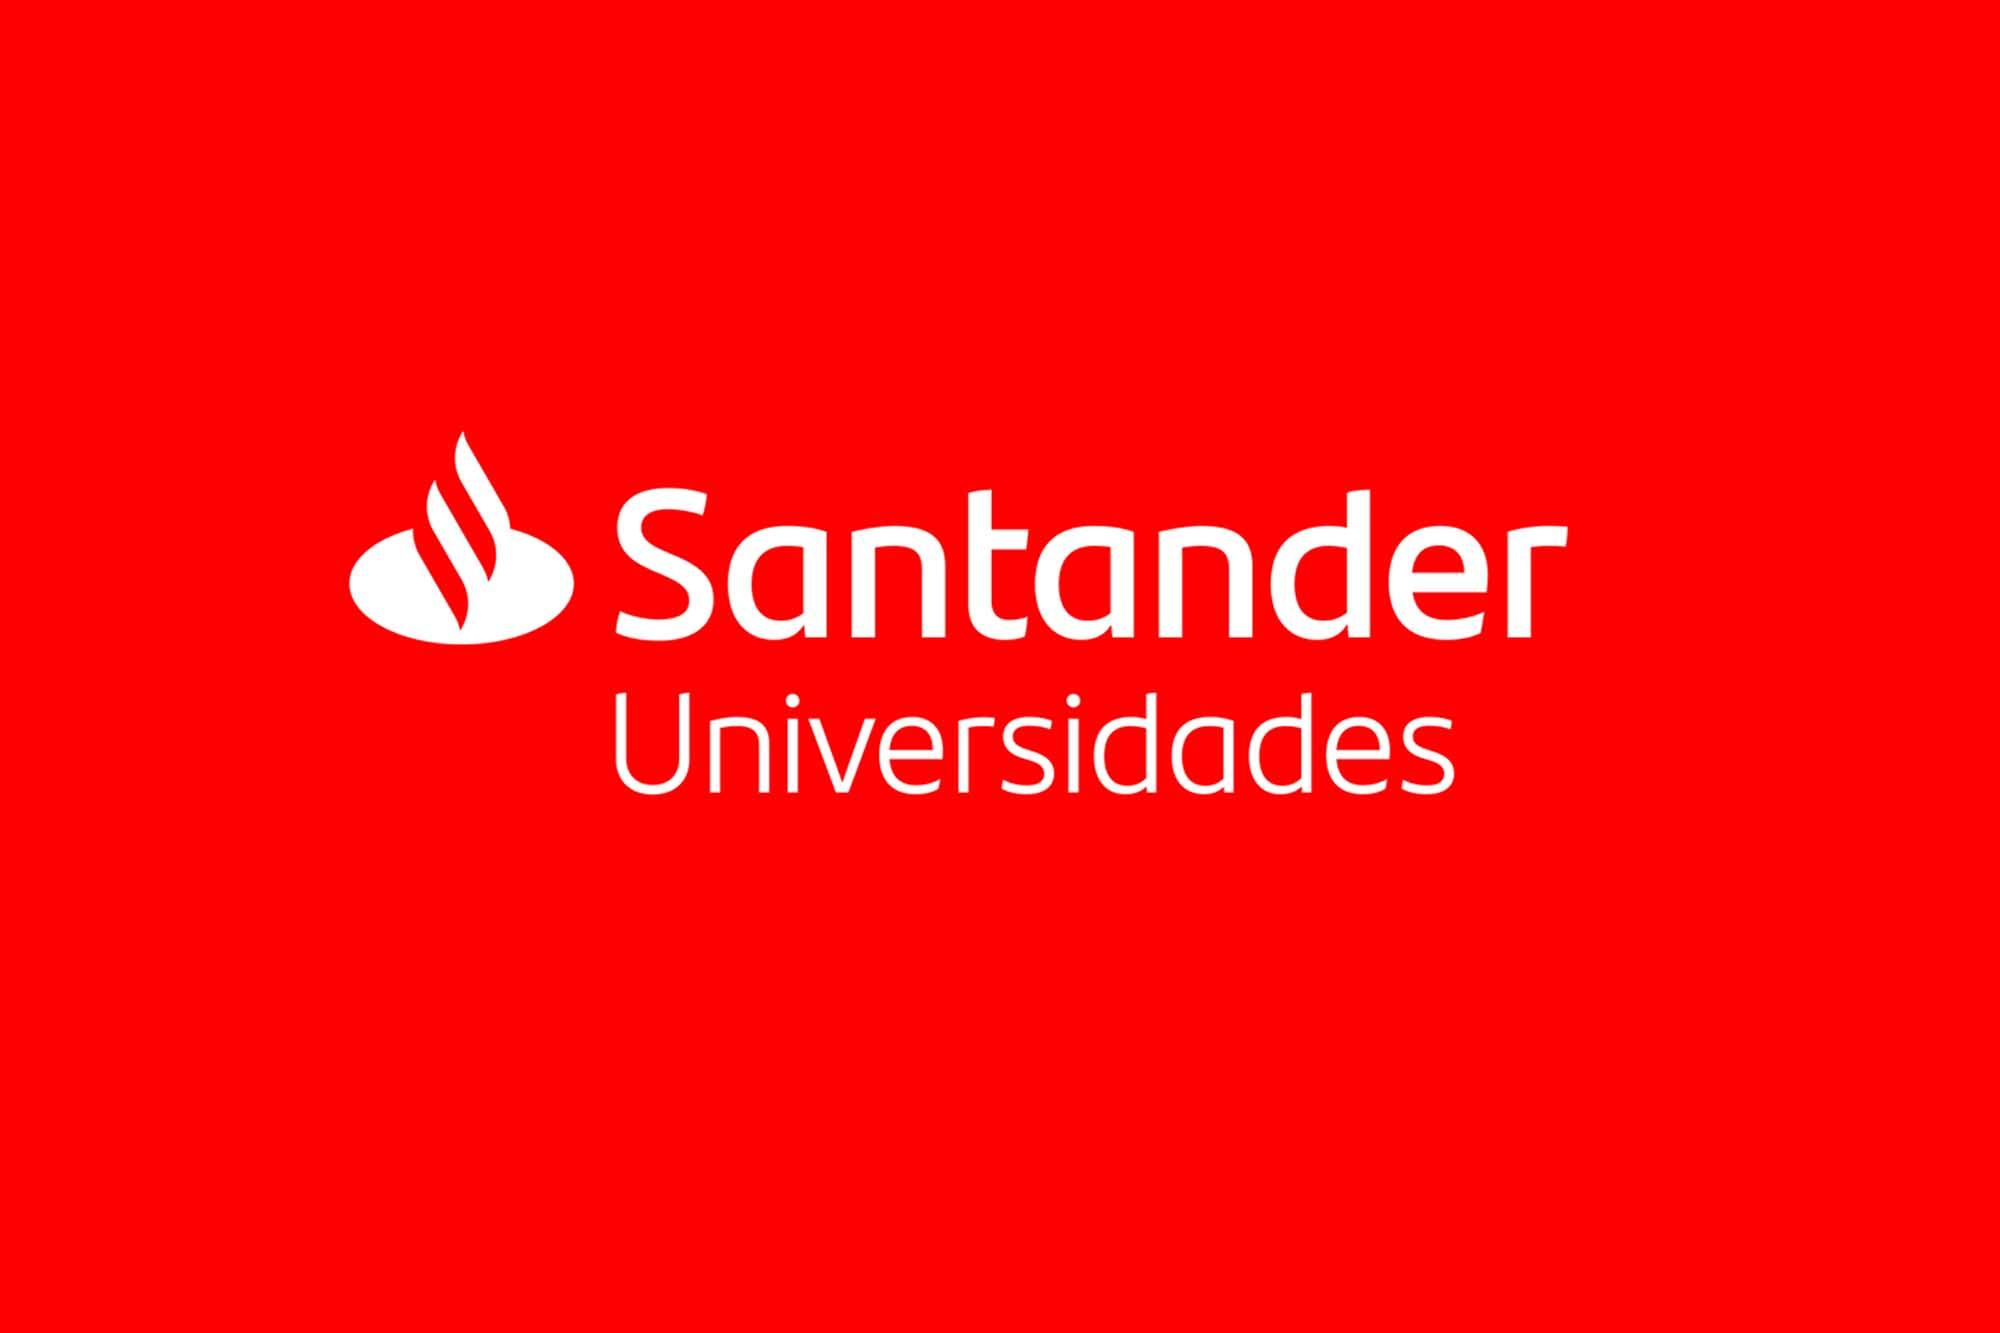 Santander Explorer 190620